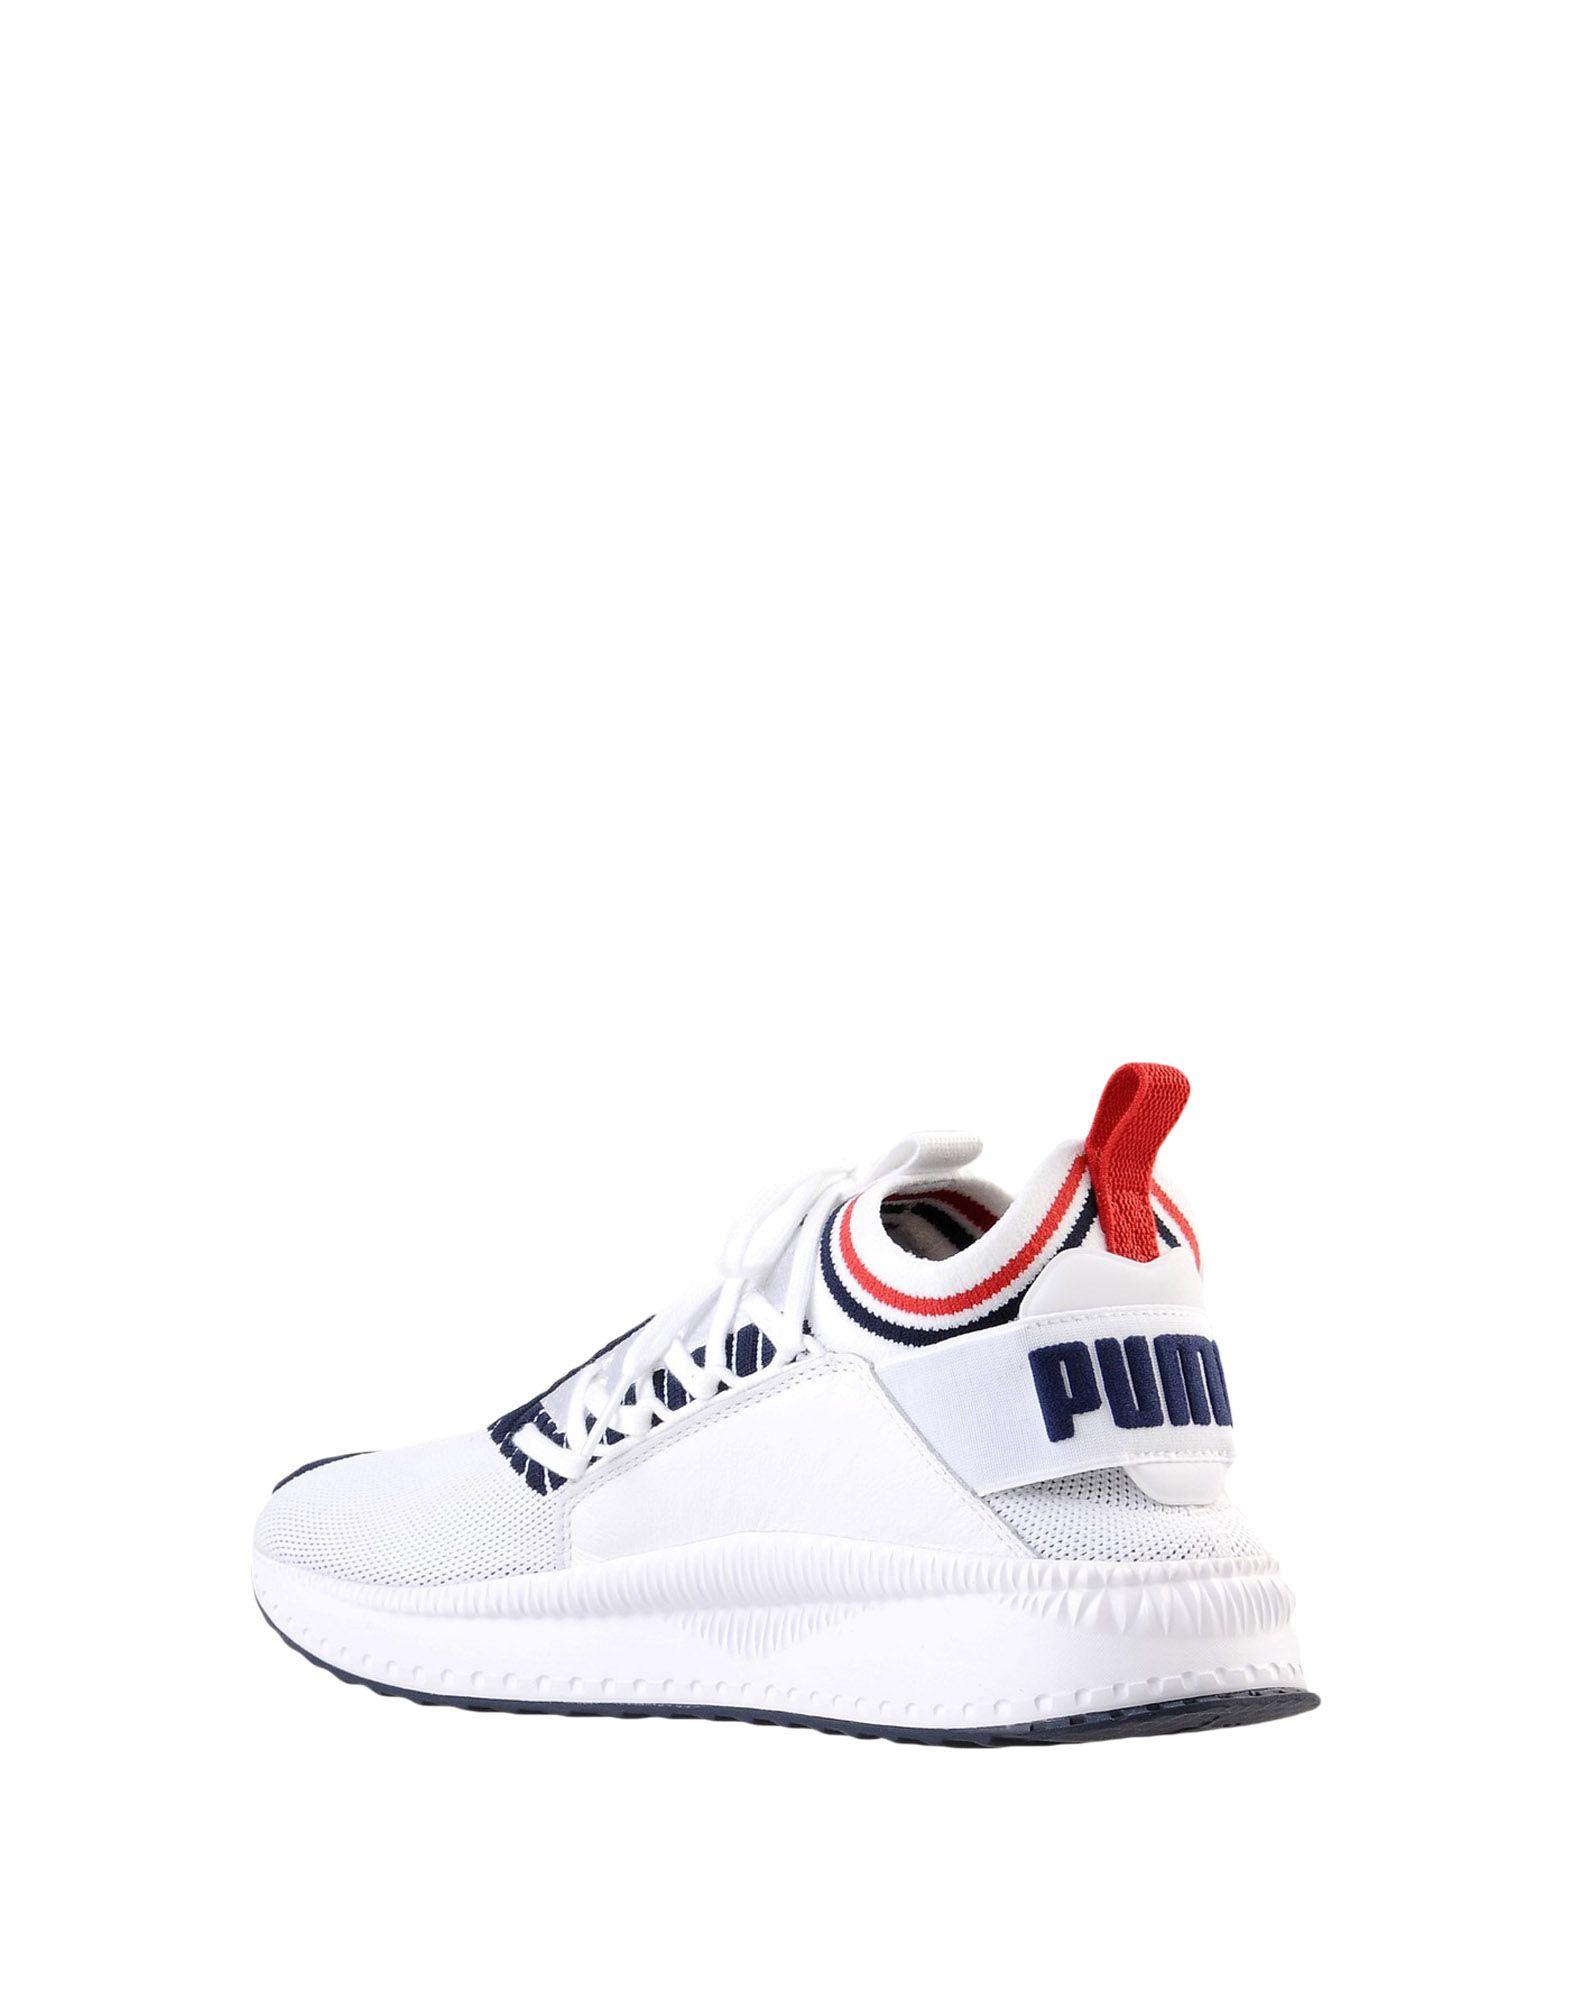 Puma Tsugi Tsugi Tsugi Jun Sport Stripes - Sneakers - Men Puma Sneakers online on  United Kingdom - 11540936OD 4cbca2